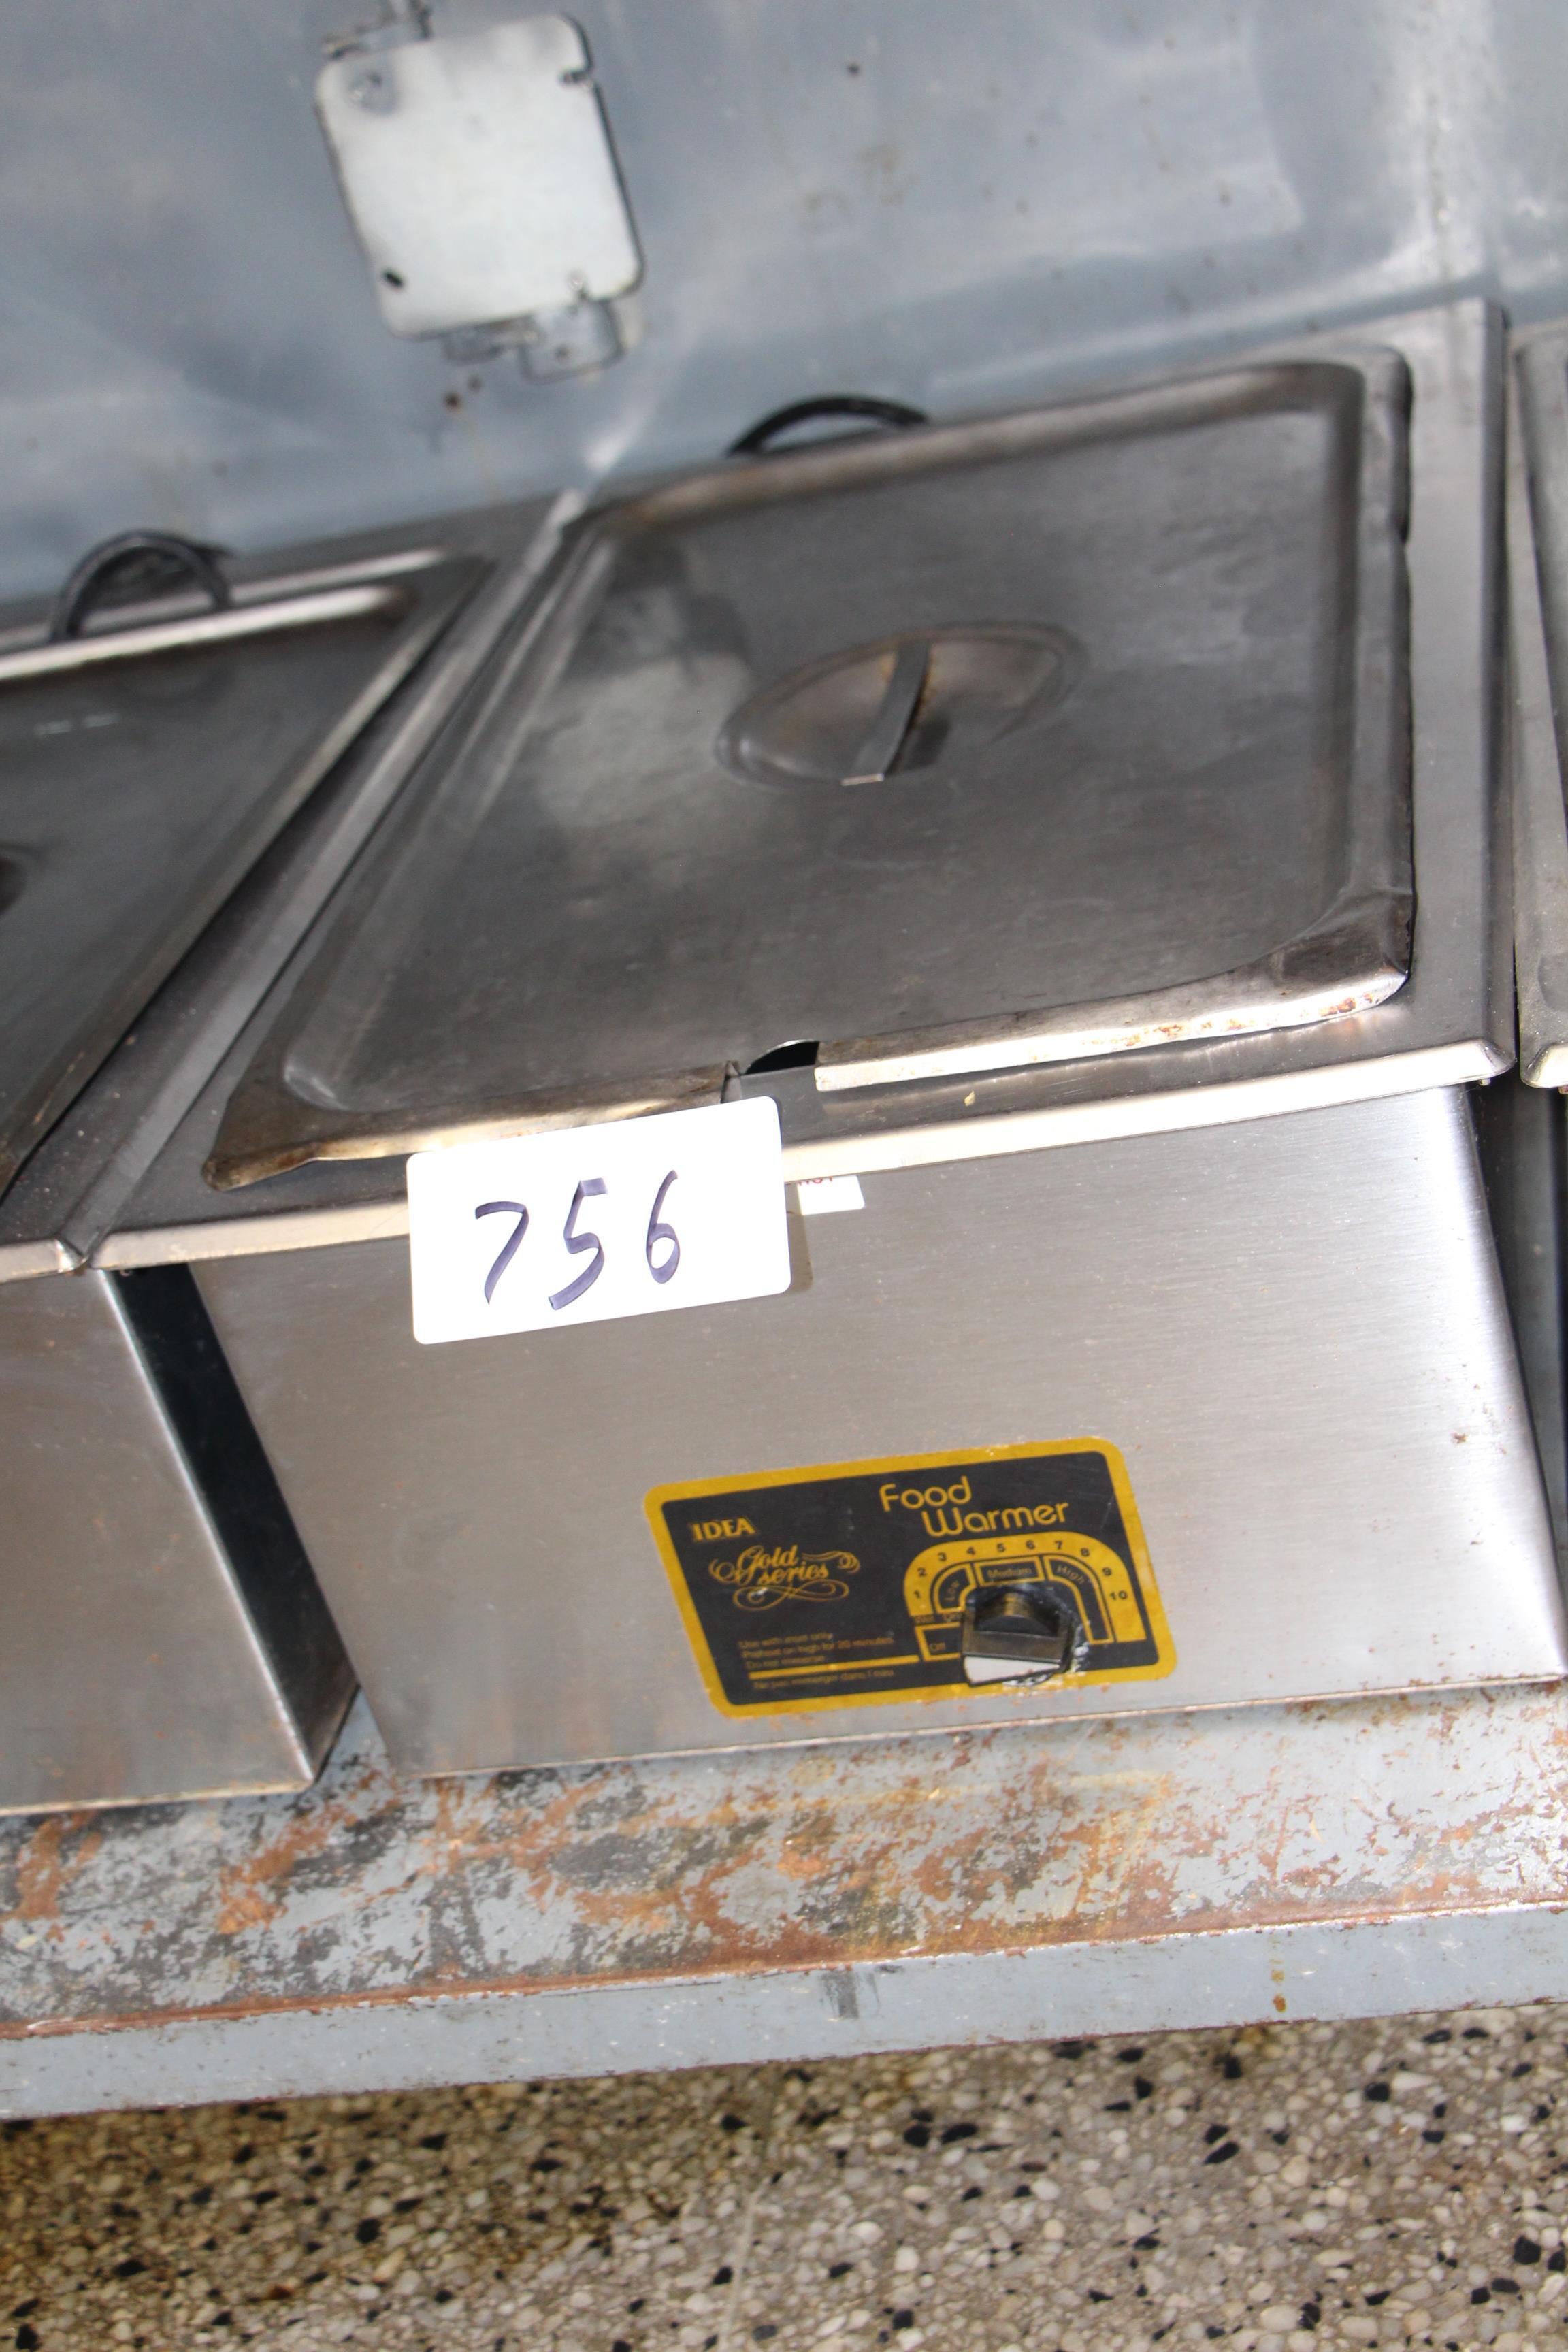 Lot 756 - Idea electric food warmer